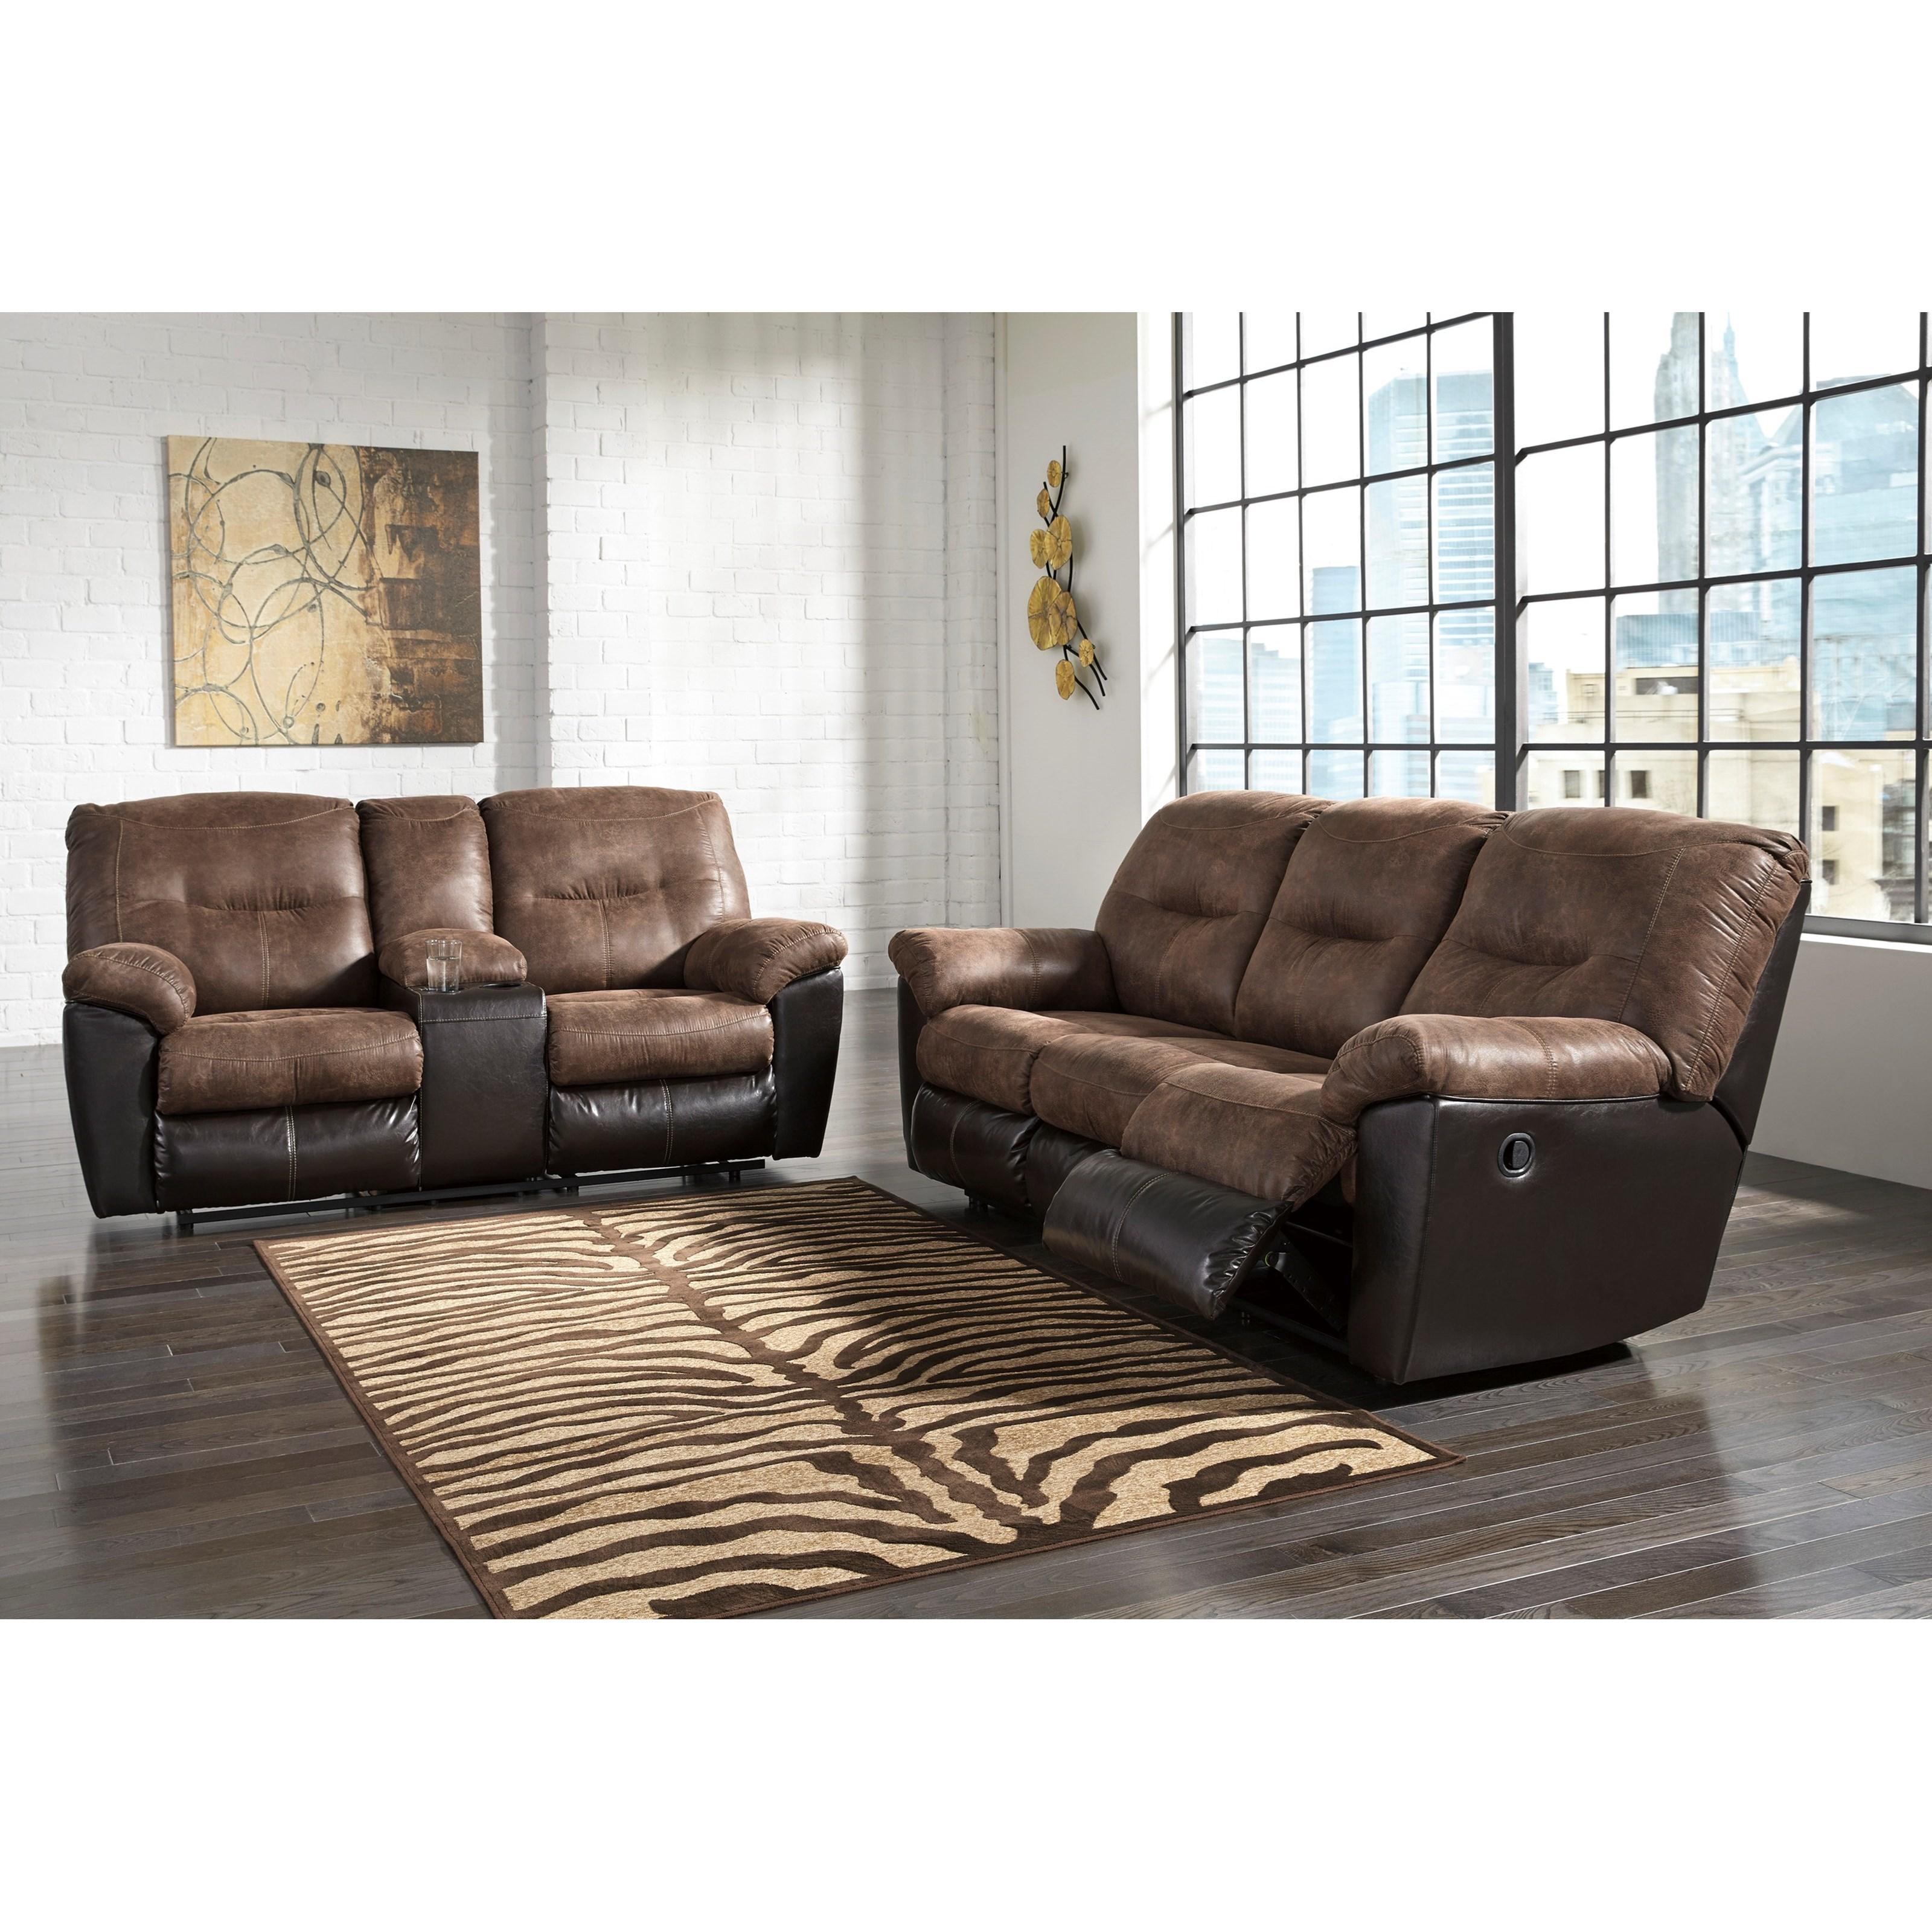 styleline lannister reclining living room group efo On efo furniture outlet